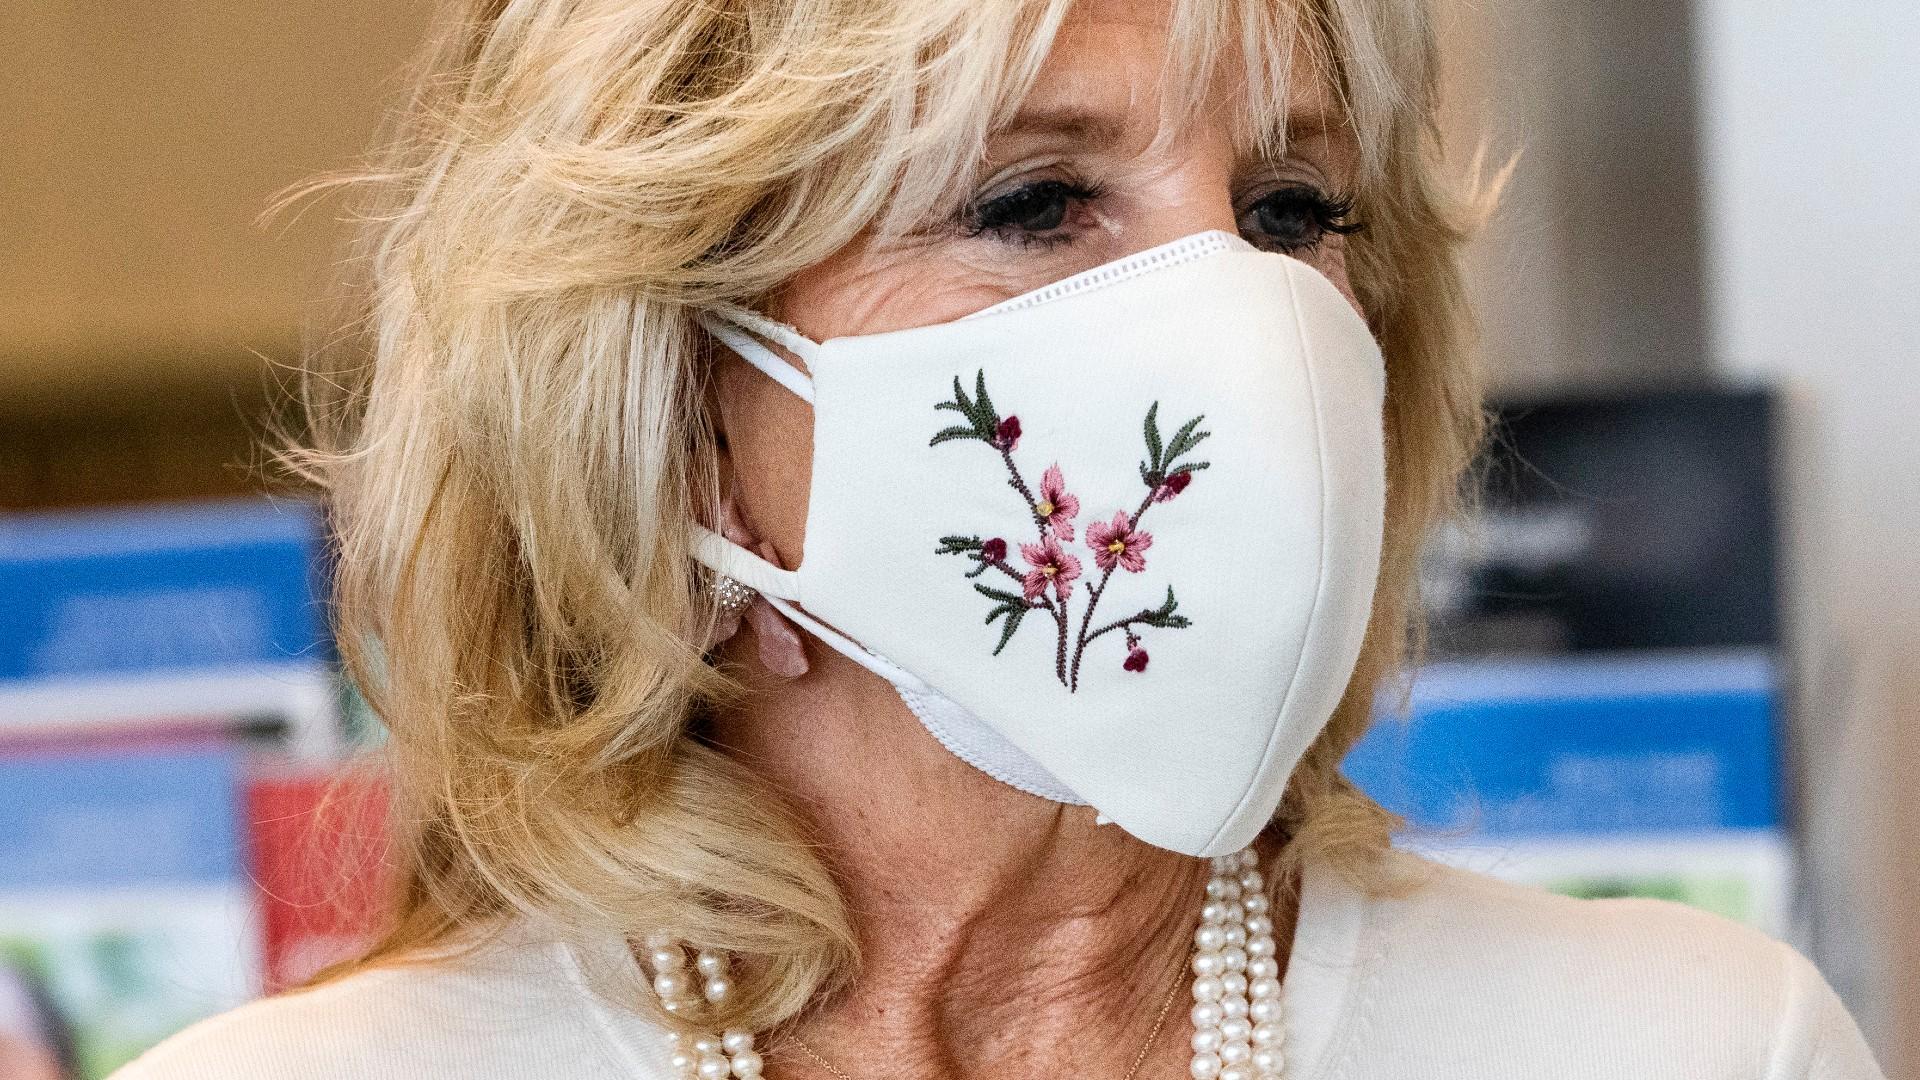 First lady Jill Biden takes a tour of Whitman-Walker Health, Friday, Jan. 22, 2021, in Washington. (AP Photo/Jacquelyn Martin, Pool)